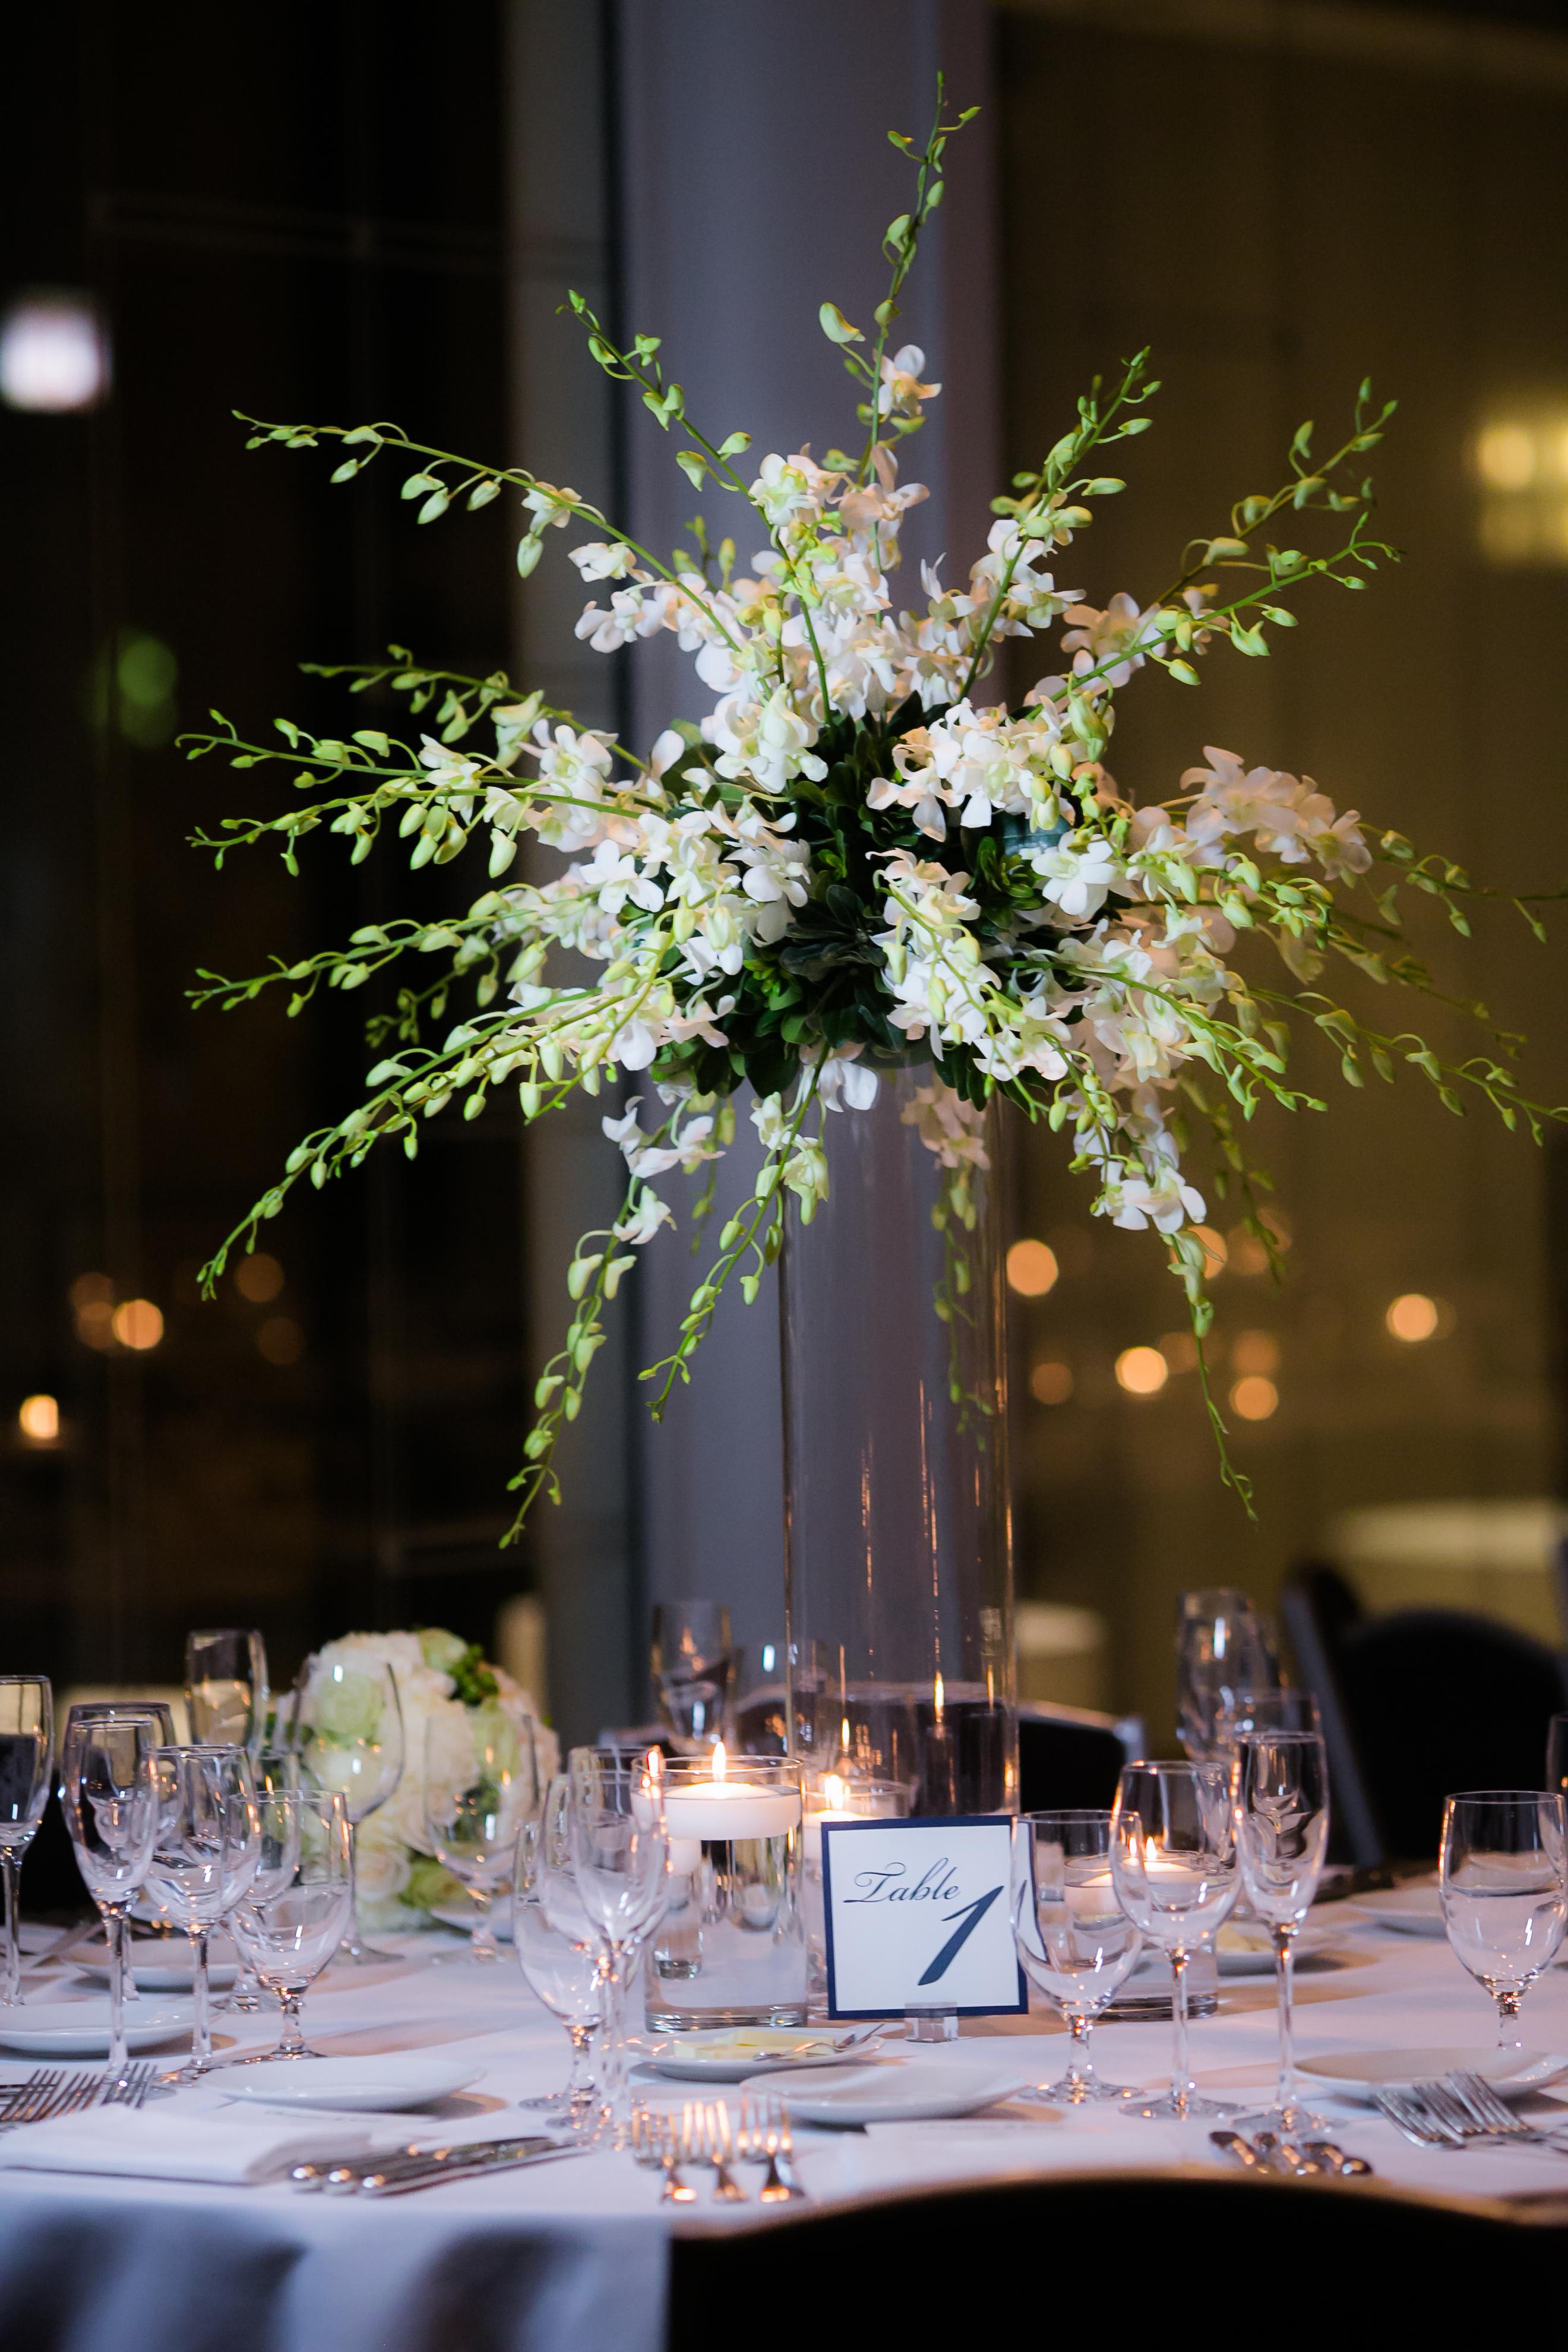 Elegant Green & White Wedding Reception - Spiaggia Restaurant and Lounge